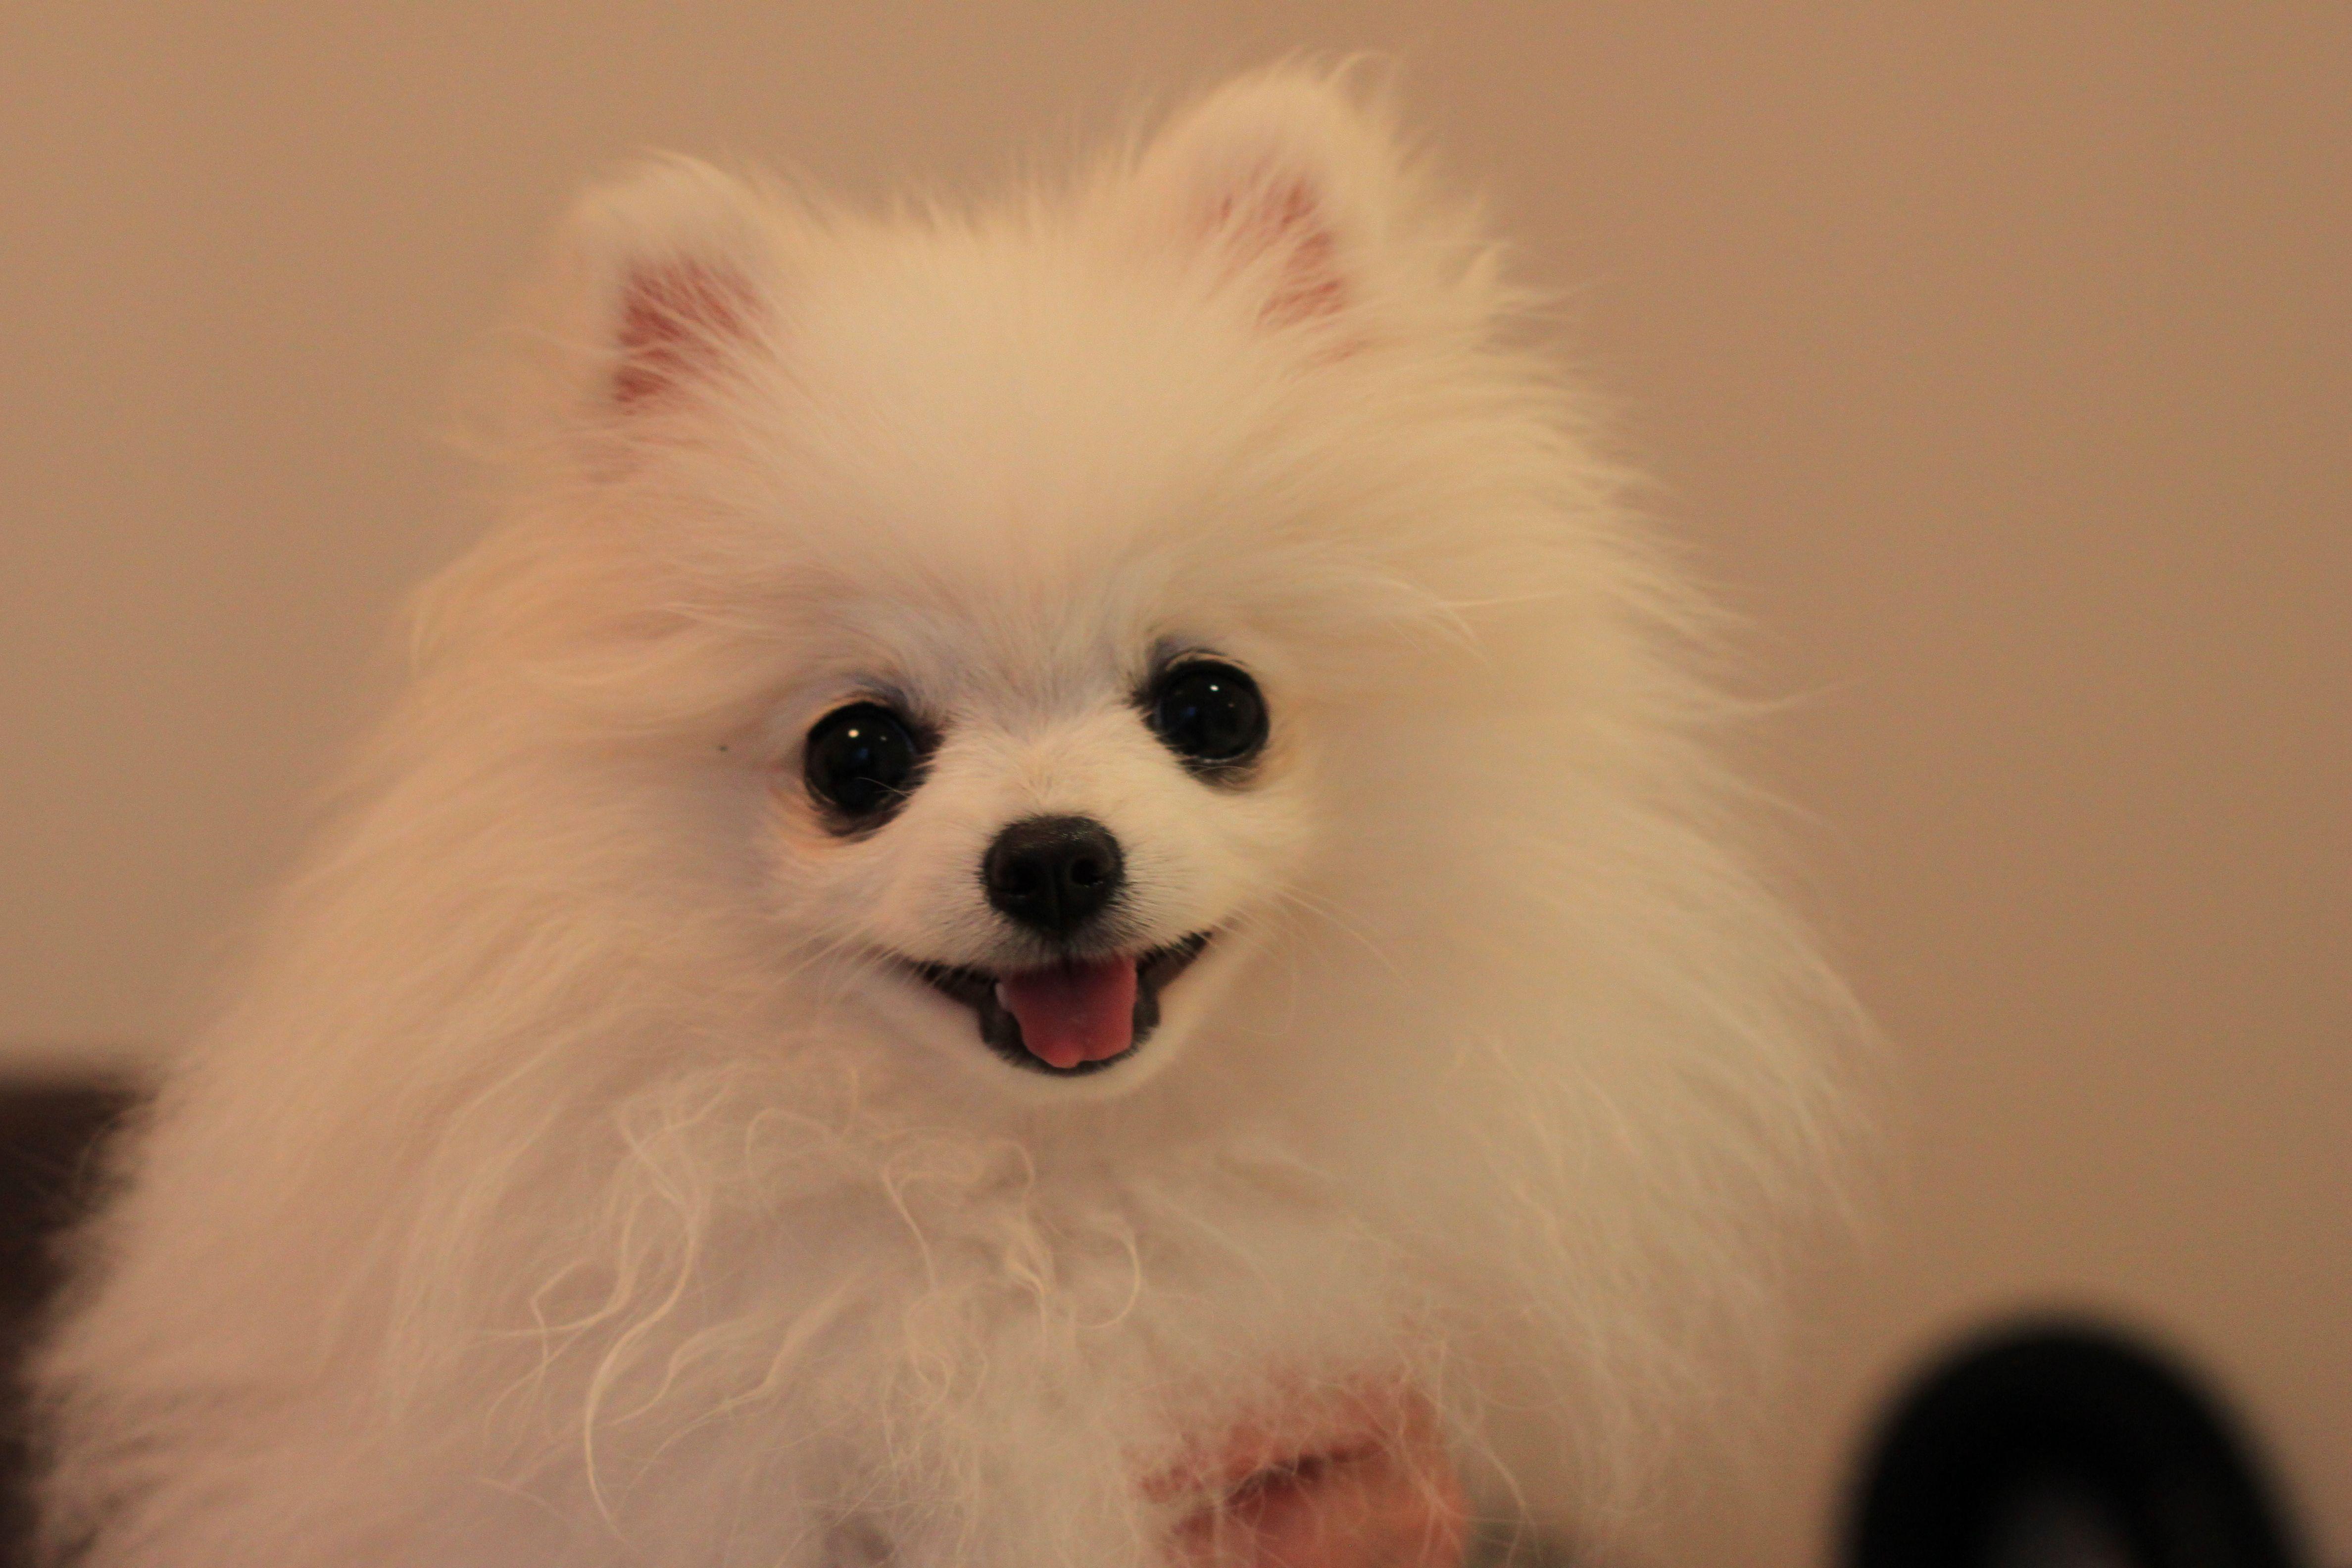 Teacup Size White Colour Purebred Pomeranian Puppy Pomeranian Puppy Pomeranian Russian Blue